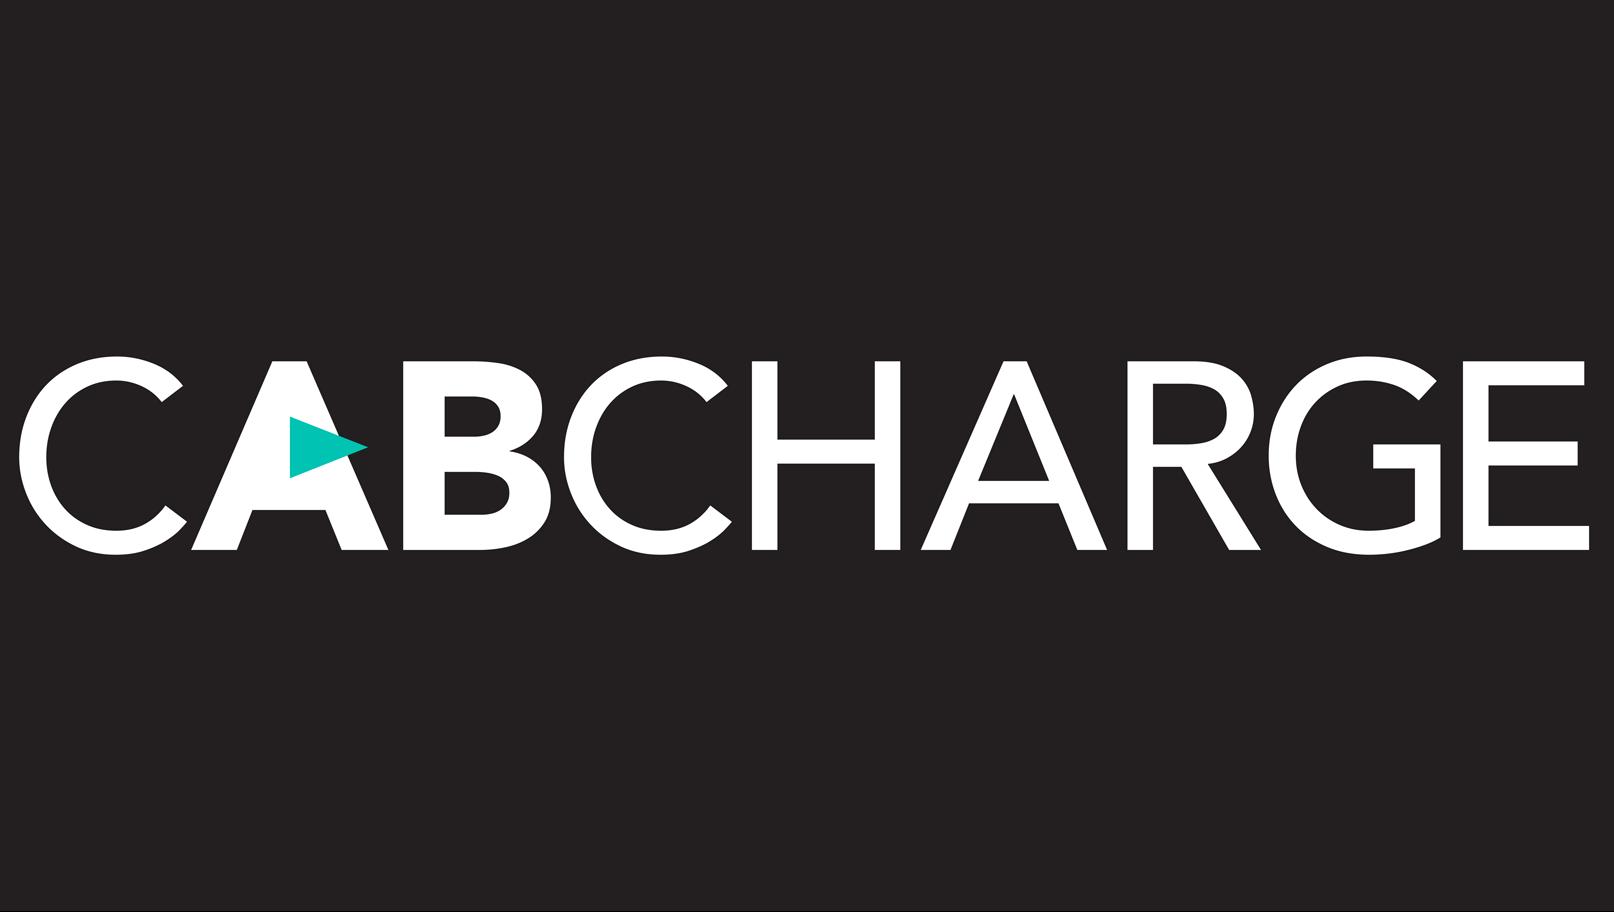 Cabcharge logo